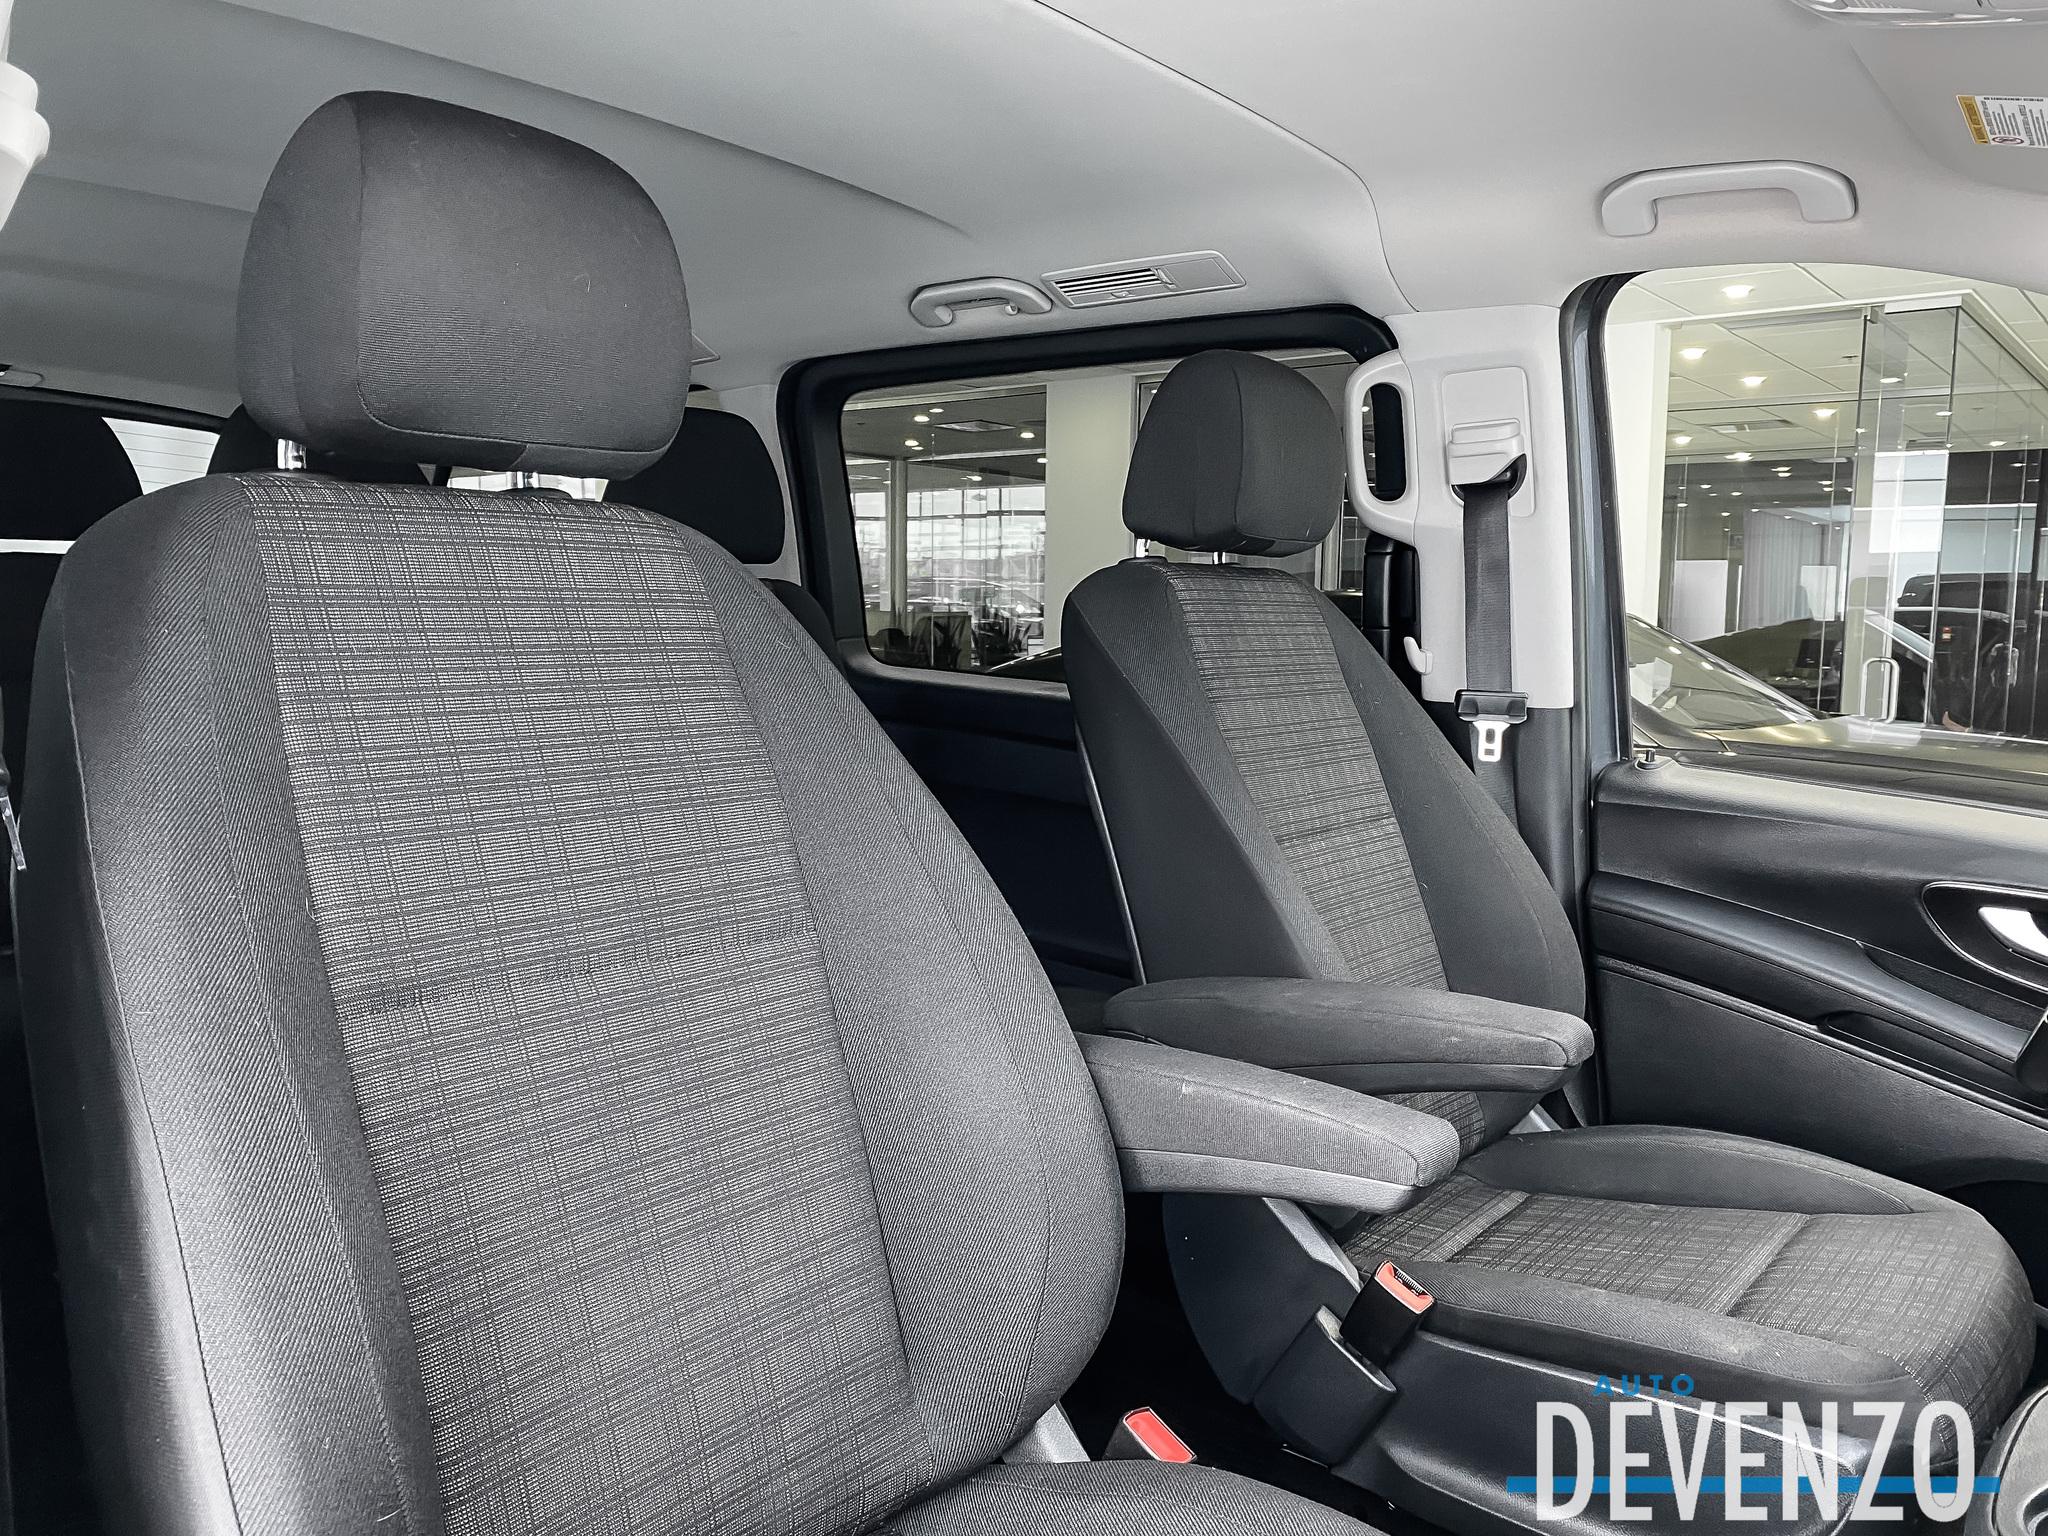 2016 Mercedes-Benz Metris Passenger Van 7 Passagers GPS Navigation / Climatisation Arriere complet